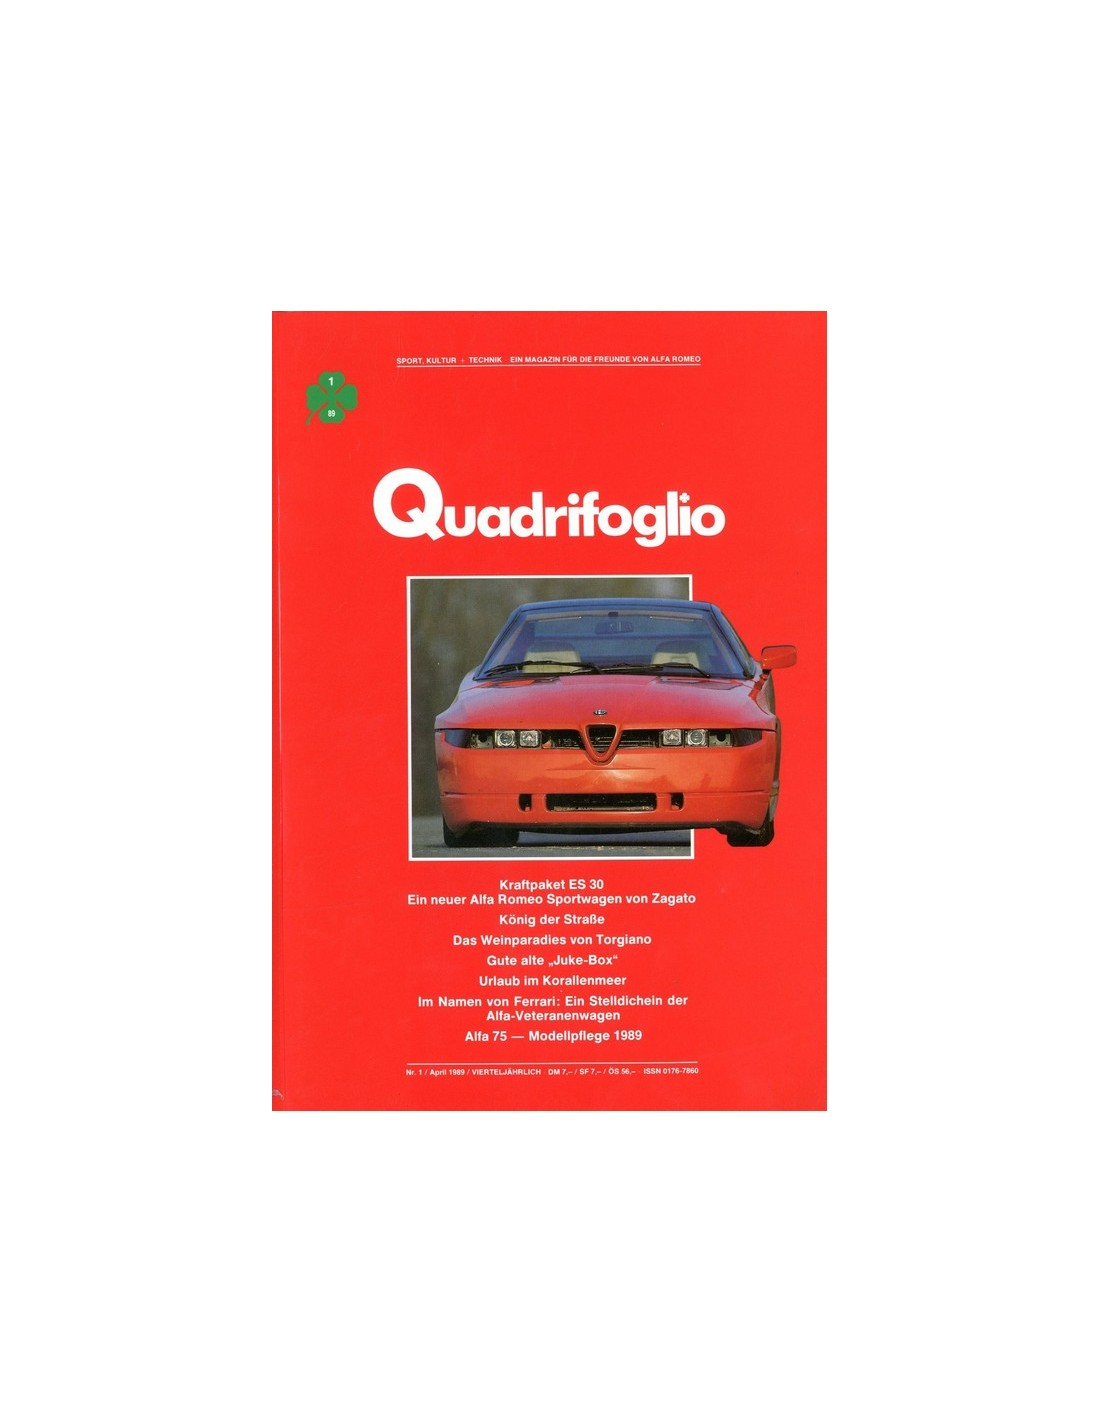 1989 ALFA ROMEO QUADRIFOGLIO MAGAZINE 1 GERMAN